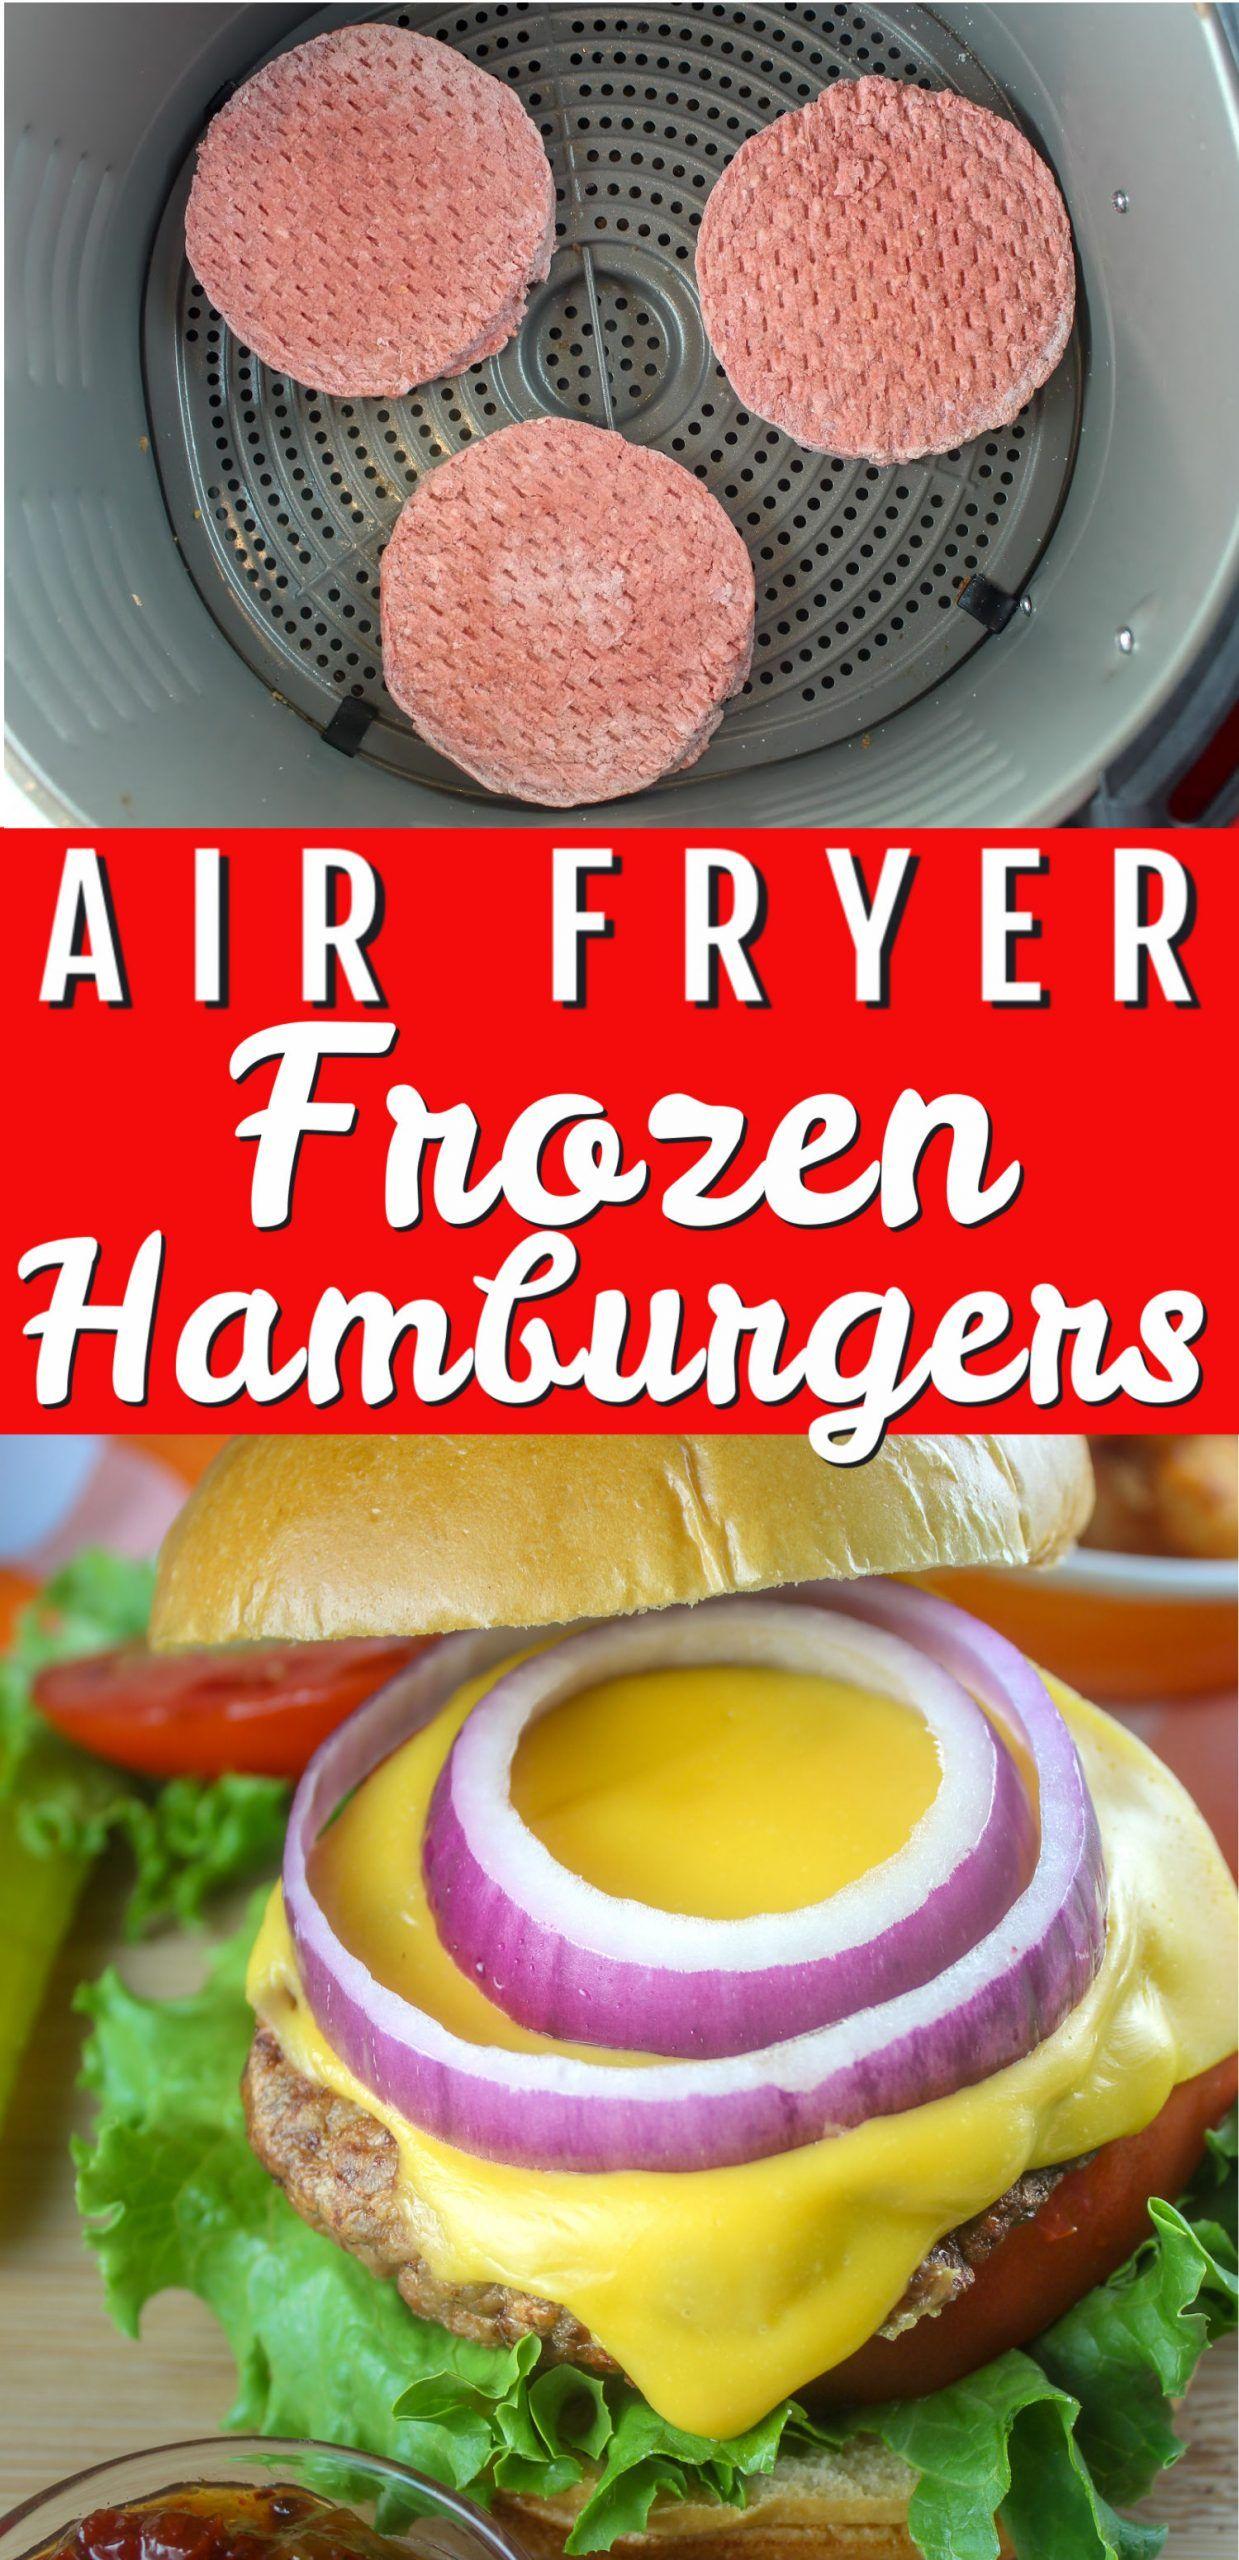 Dinner just got easier making frozen hamburgers in your